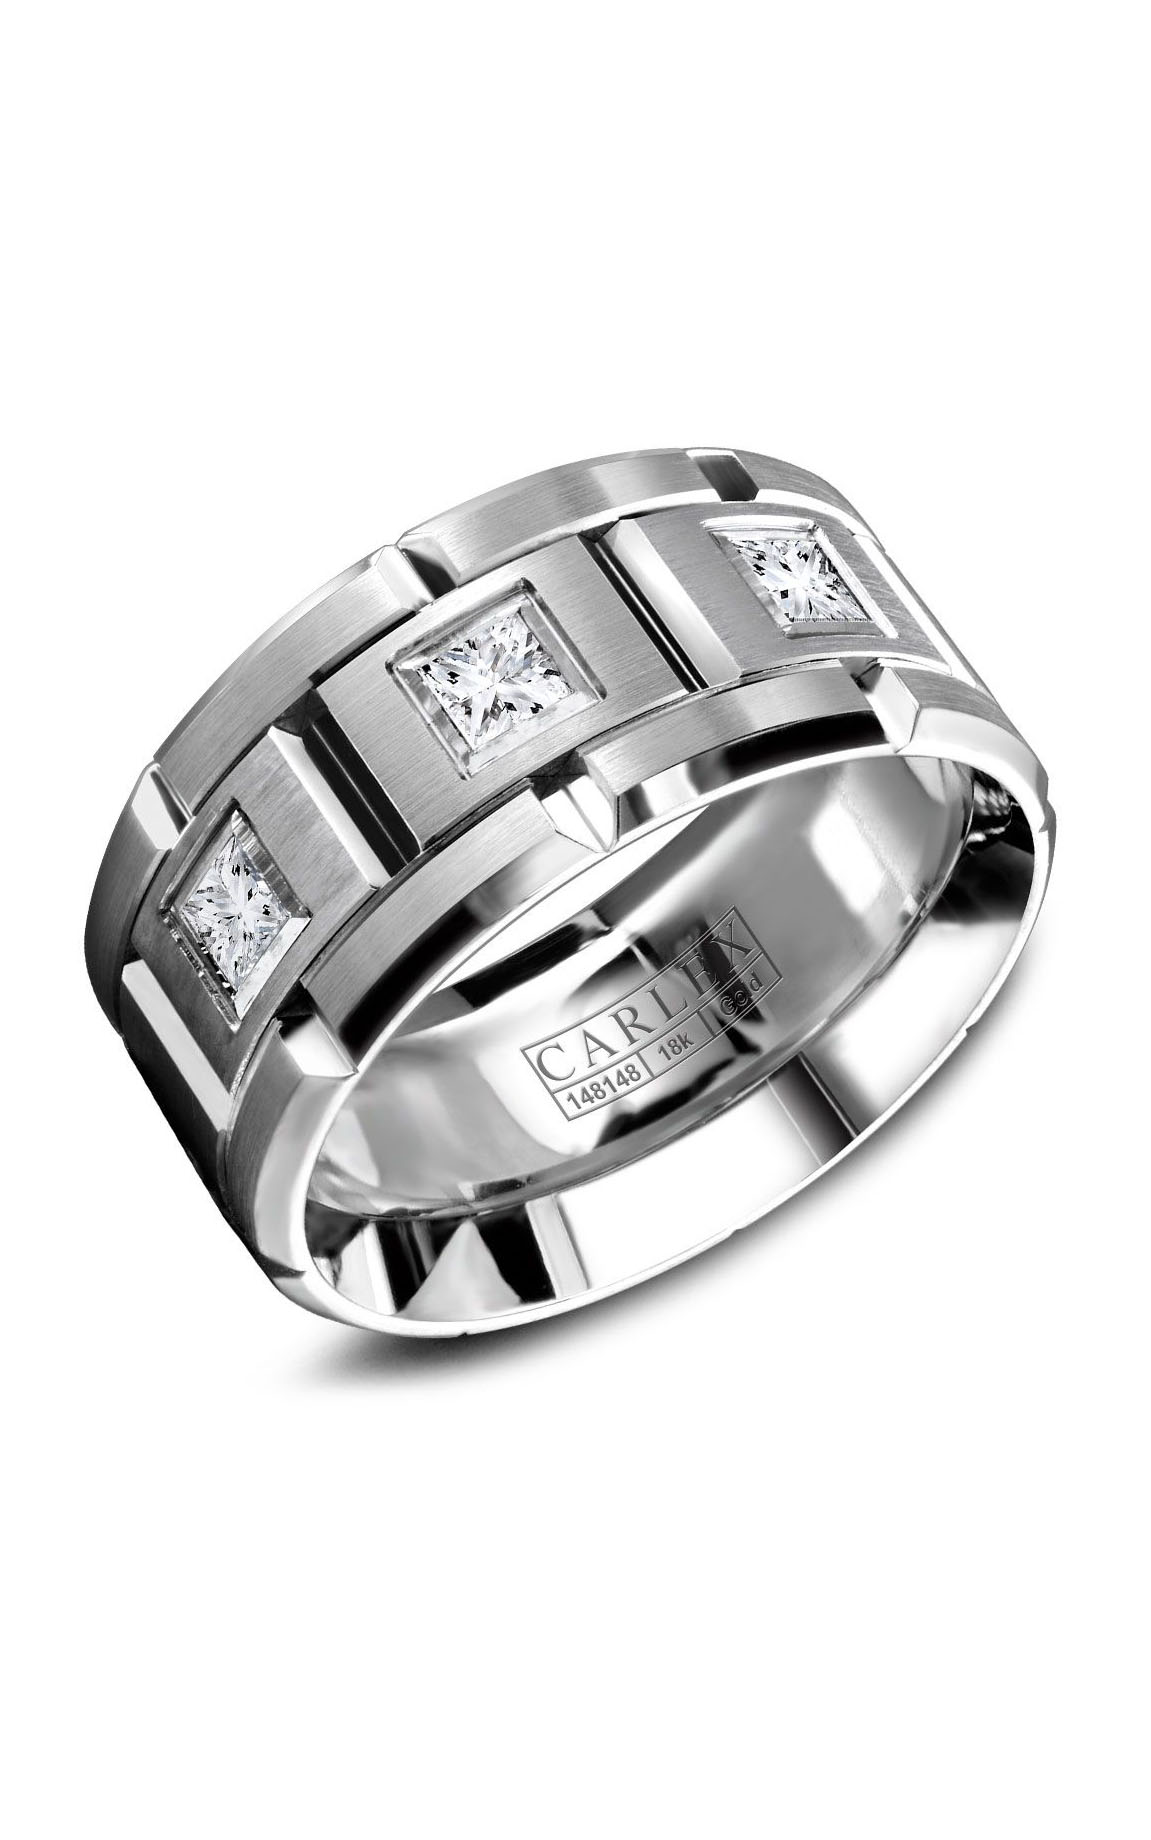 Carlex G1 Men's Wedding Band WB-9482 product image